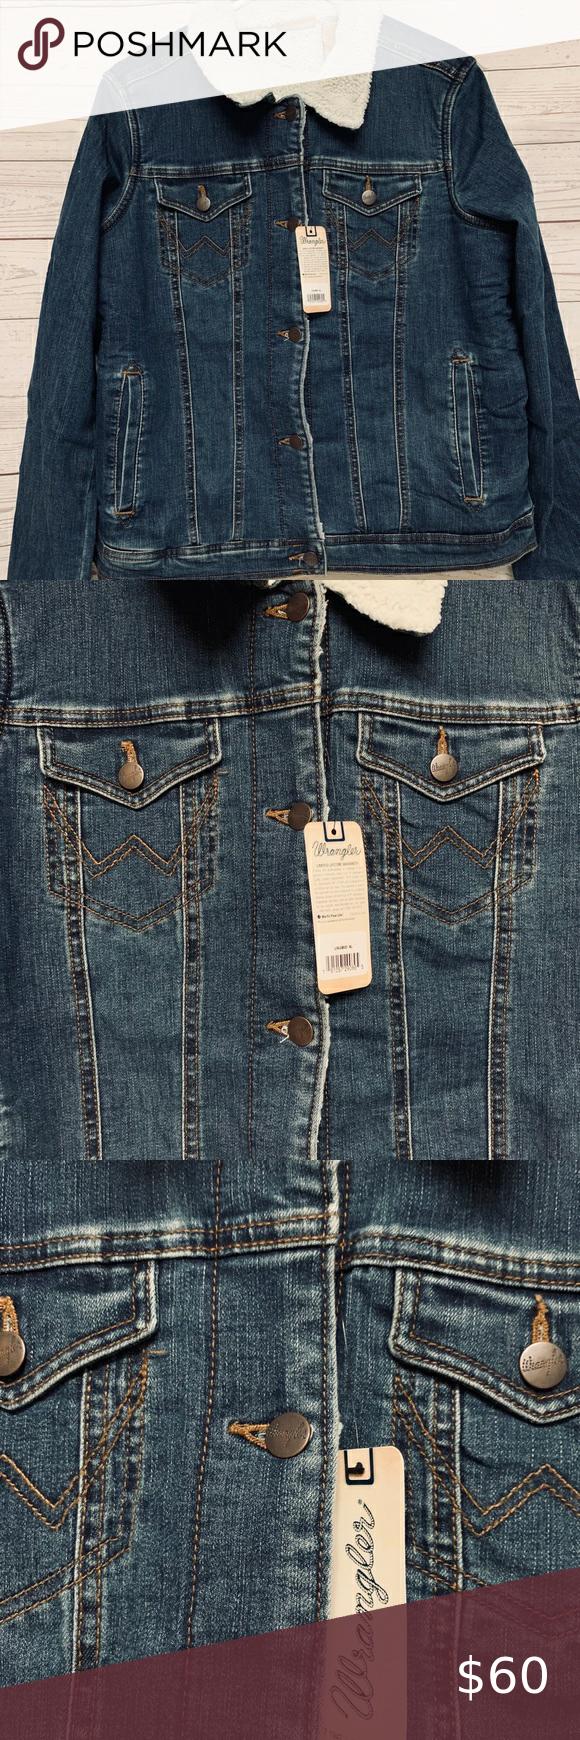 Wrangler Sherpa Jean Jacket Super Cute And New With Tags Wrangler Denim Sherpa Jacket Size Extra Vintage Denim Jacket Vintage Wrangler Jeans Fitted Jean Jacket [ 1740 x 580 Pixel ]